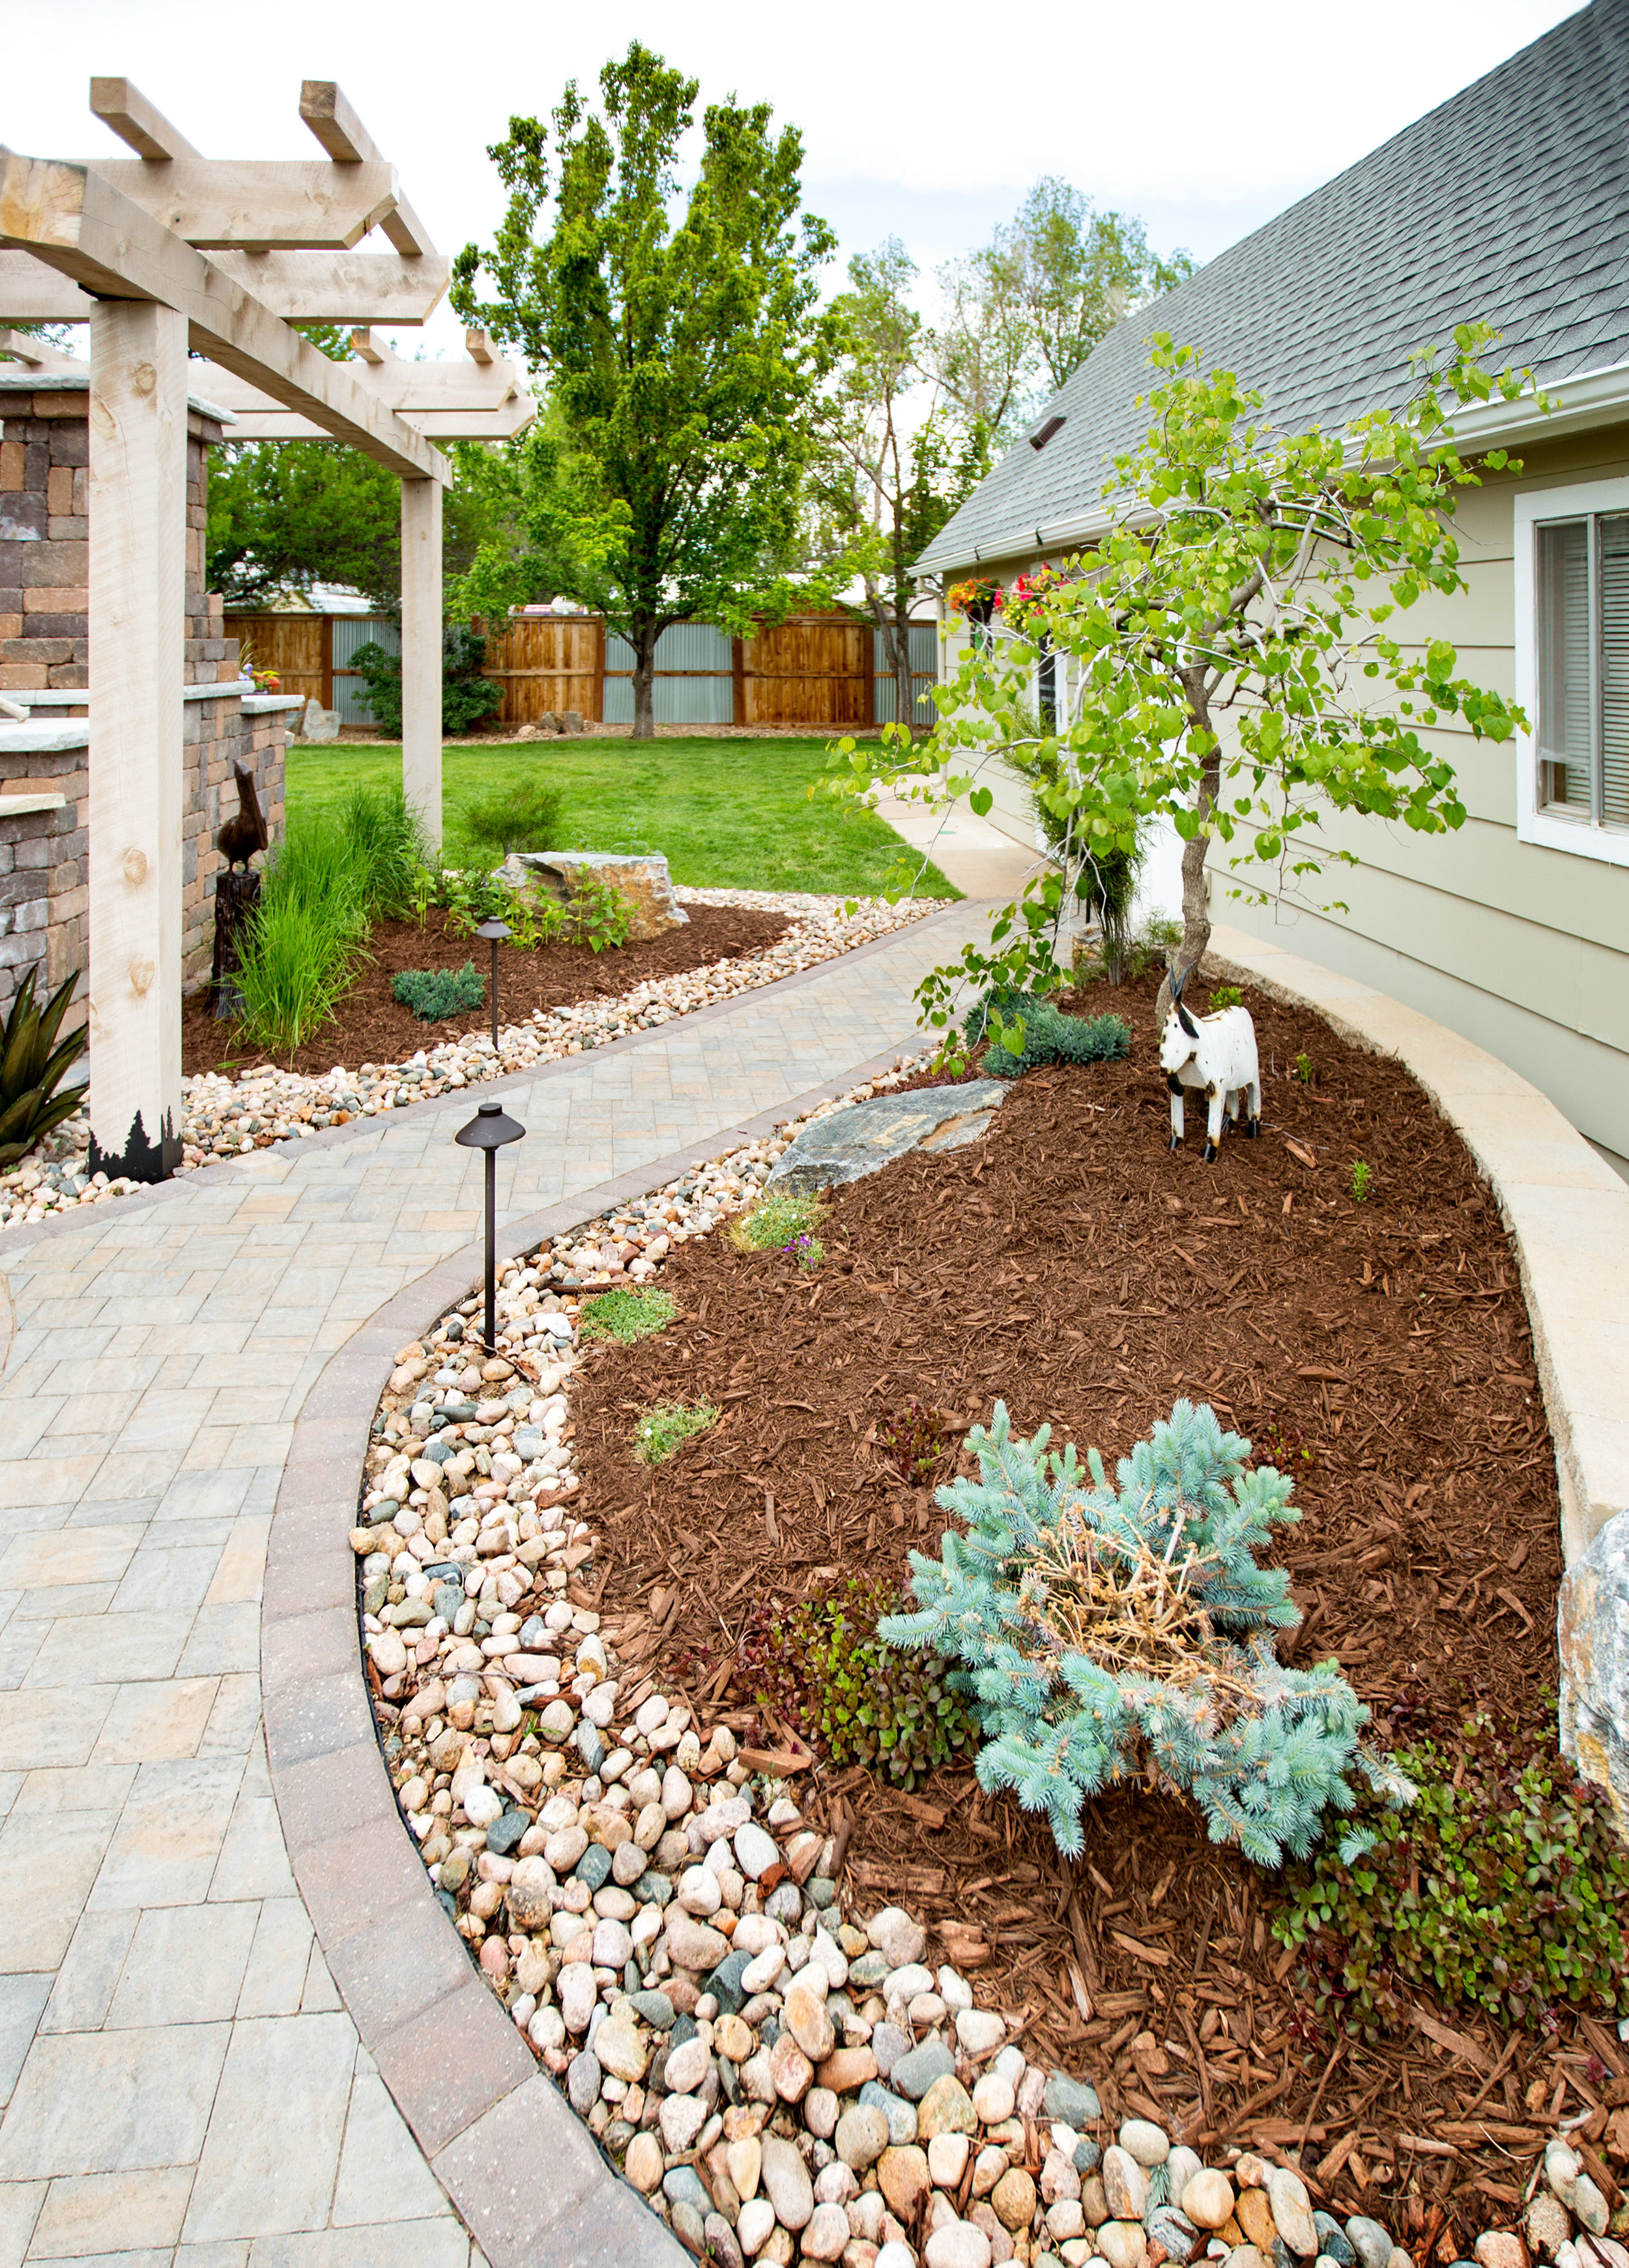 Zak George Landscaping - Residential Landscape Design & Install-10.jpg